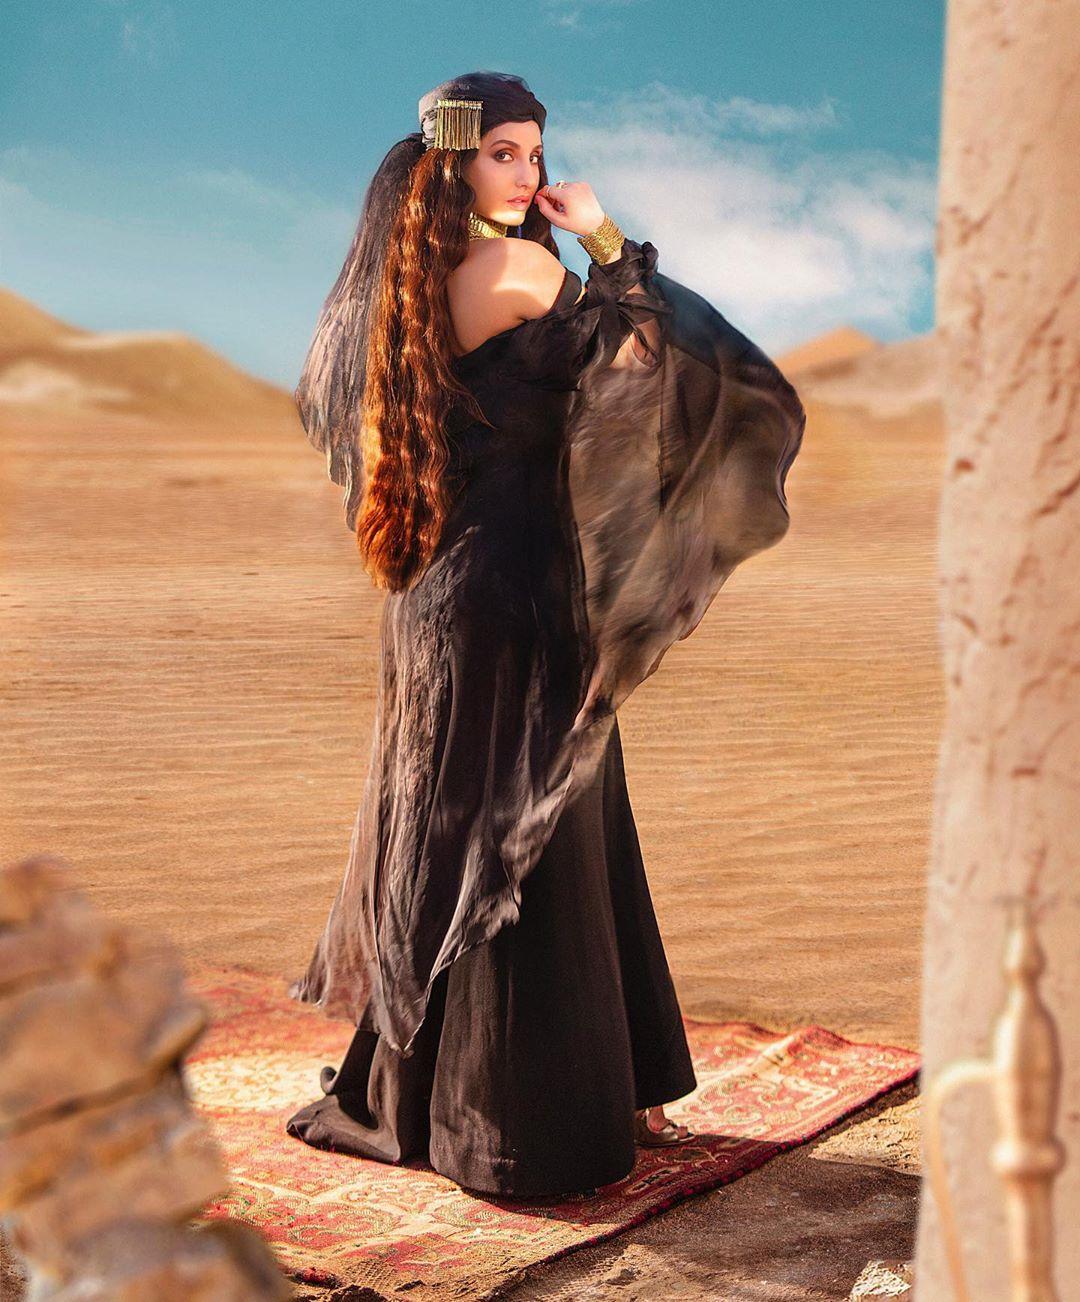 Nora-Fatehi-Wallpapers-Insta-Fit-Bio-7